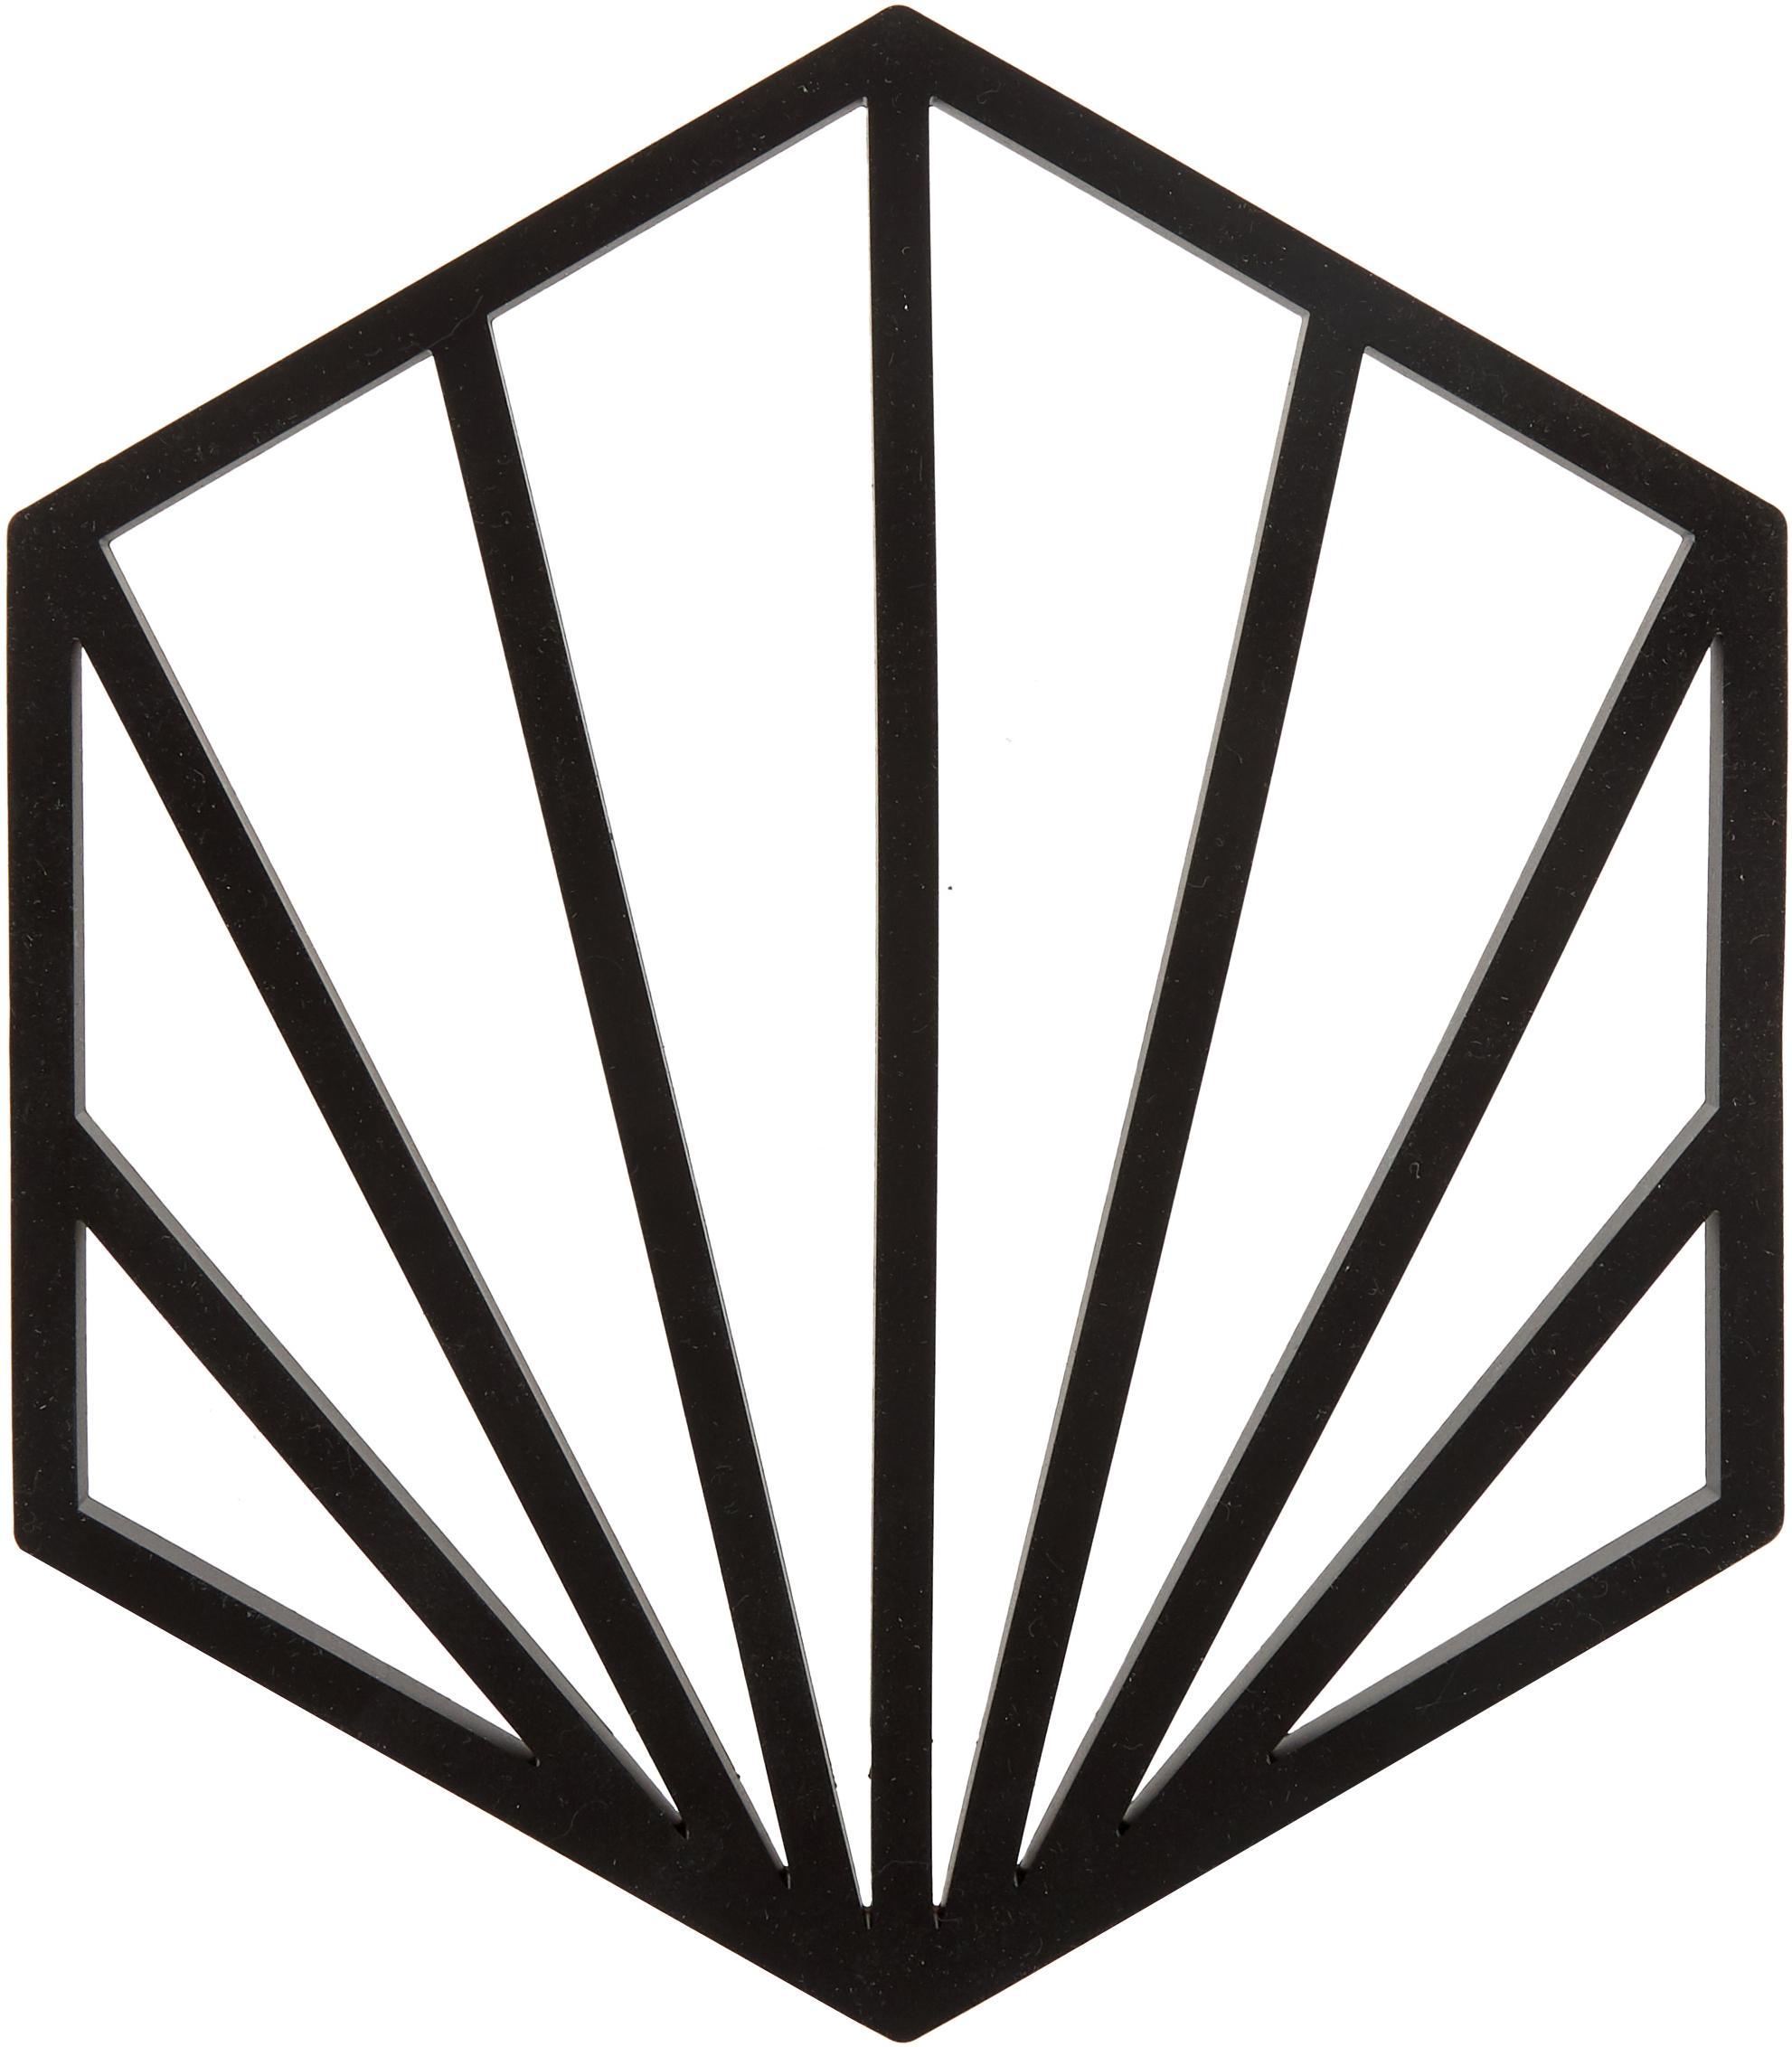 Silikon Topfuntersetzer Shell, 2 Stück, Silikon, Schwarz, 16 x 1 cm